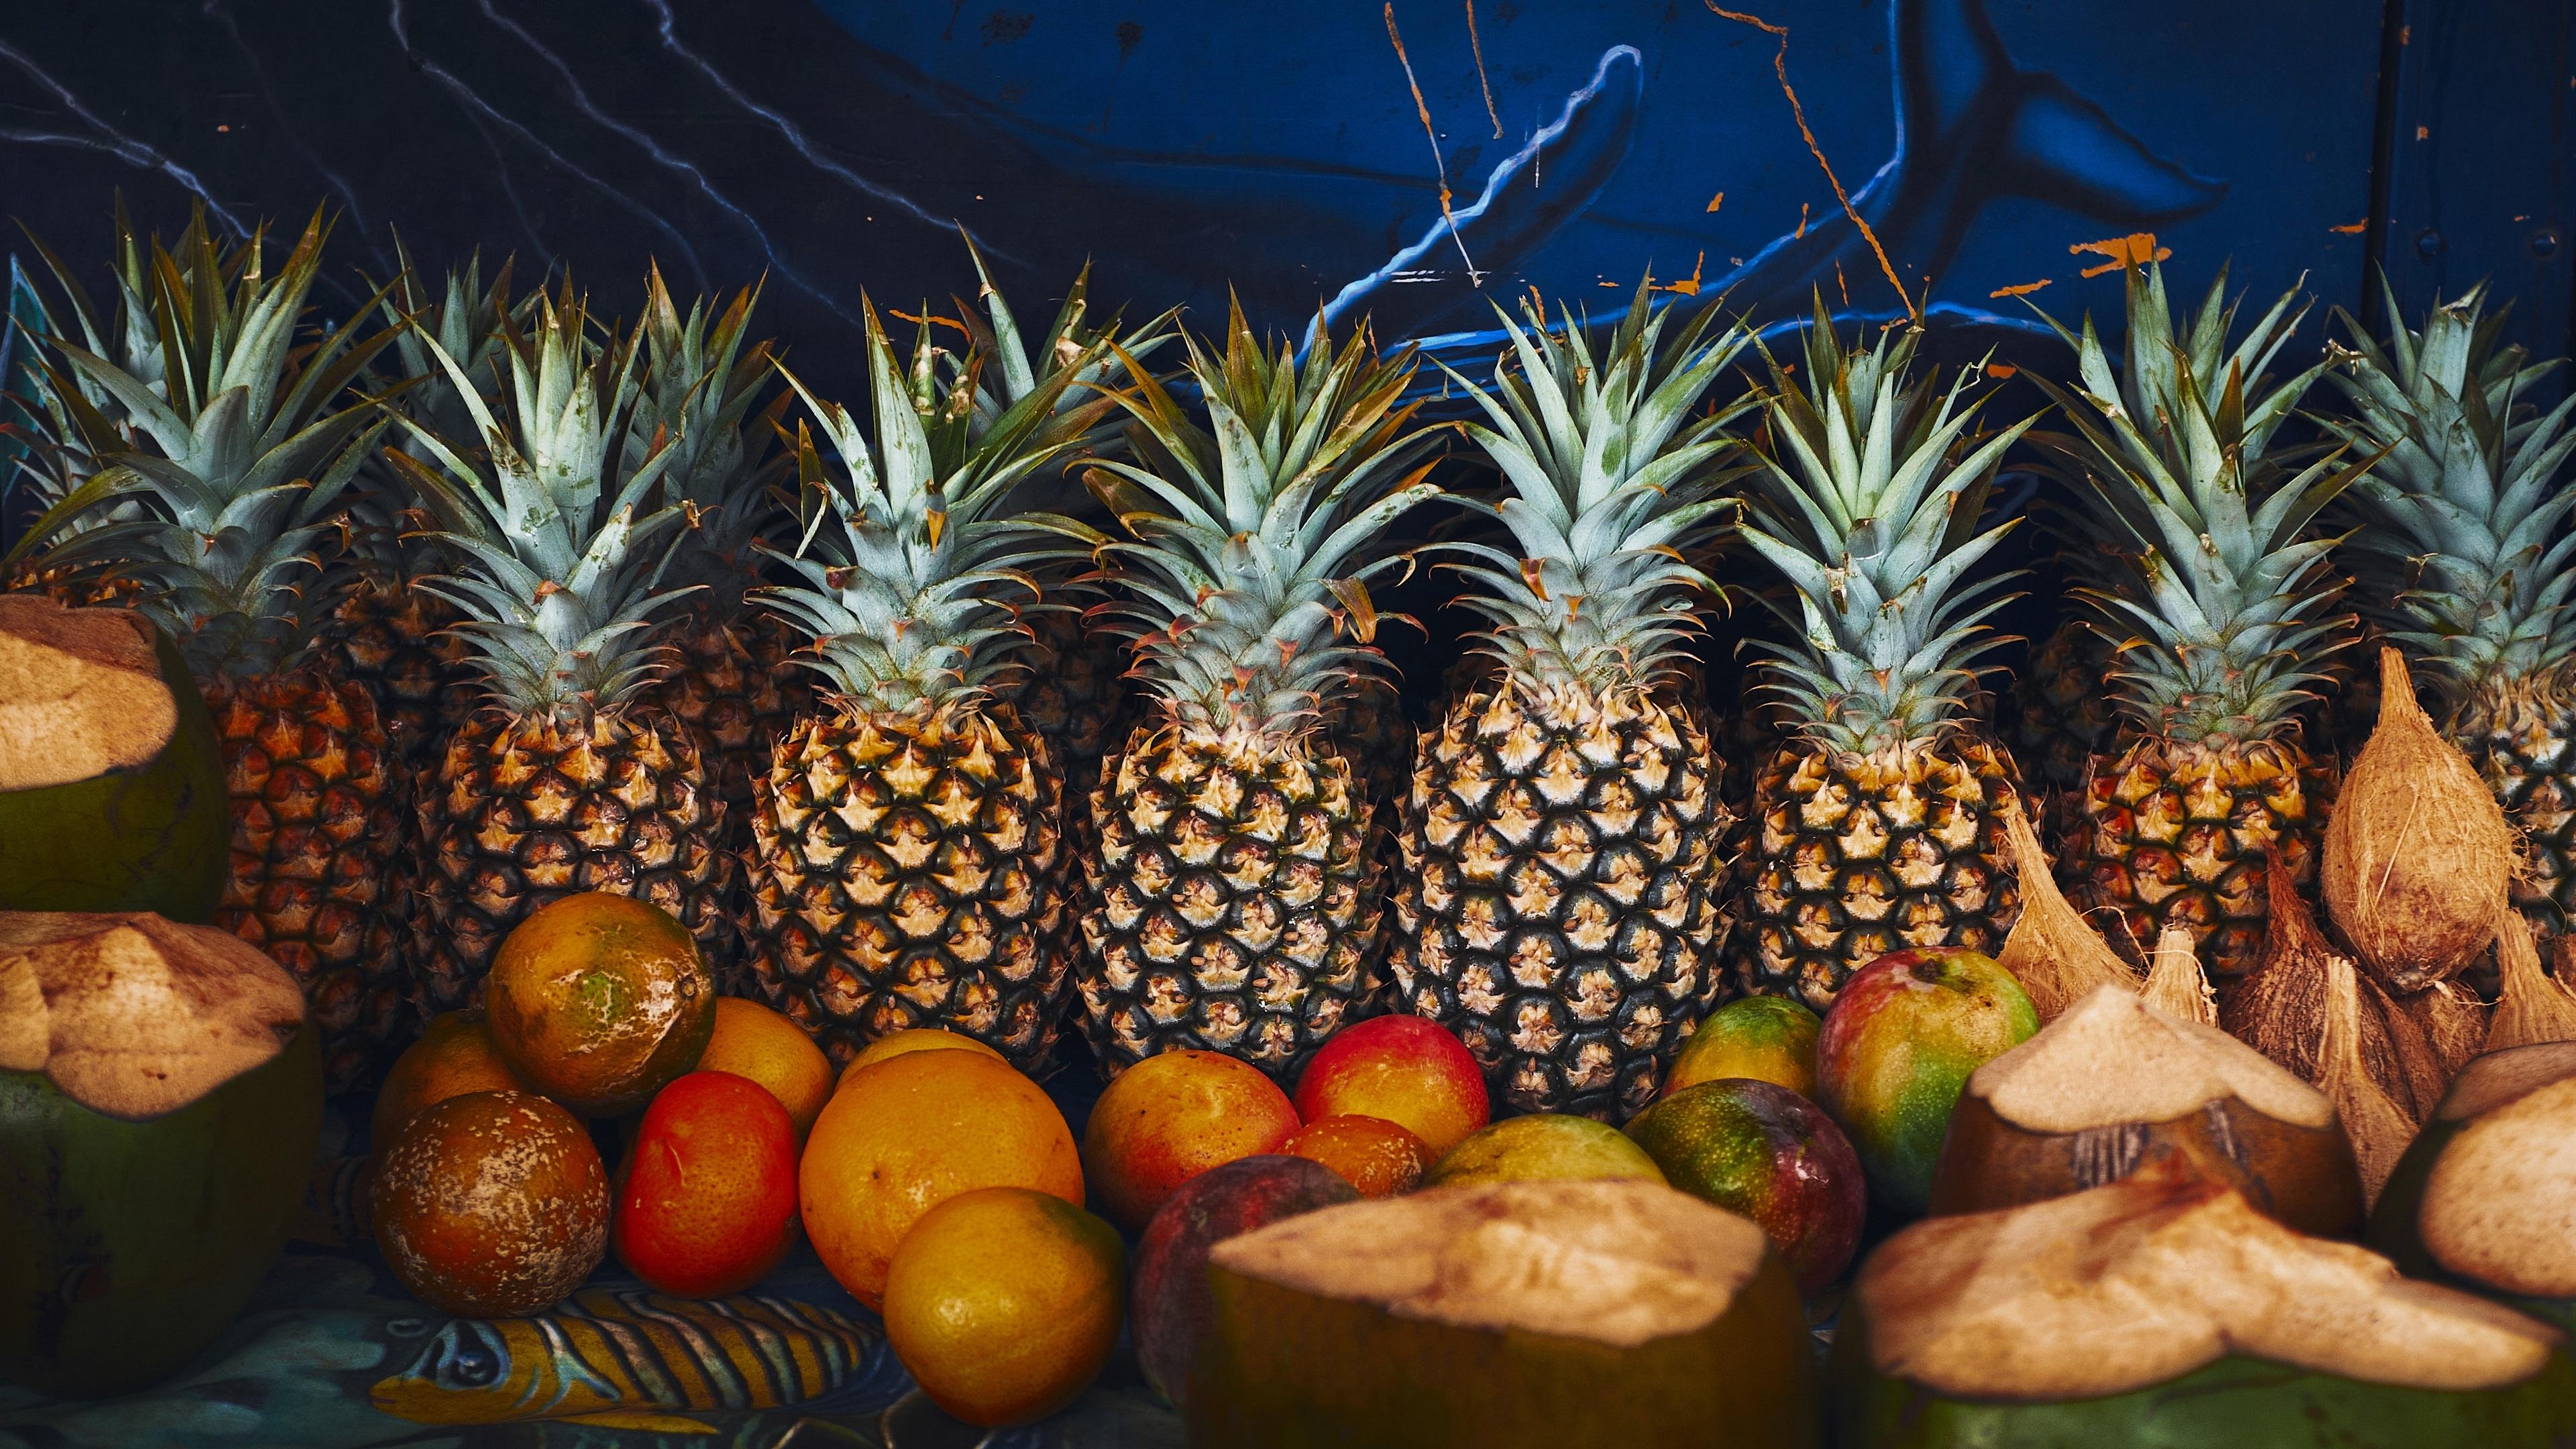 Pineapple oranges